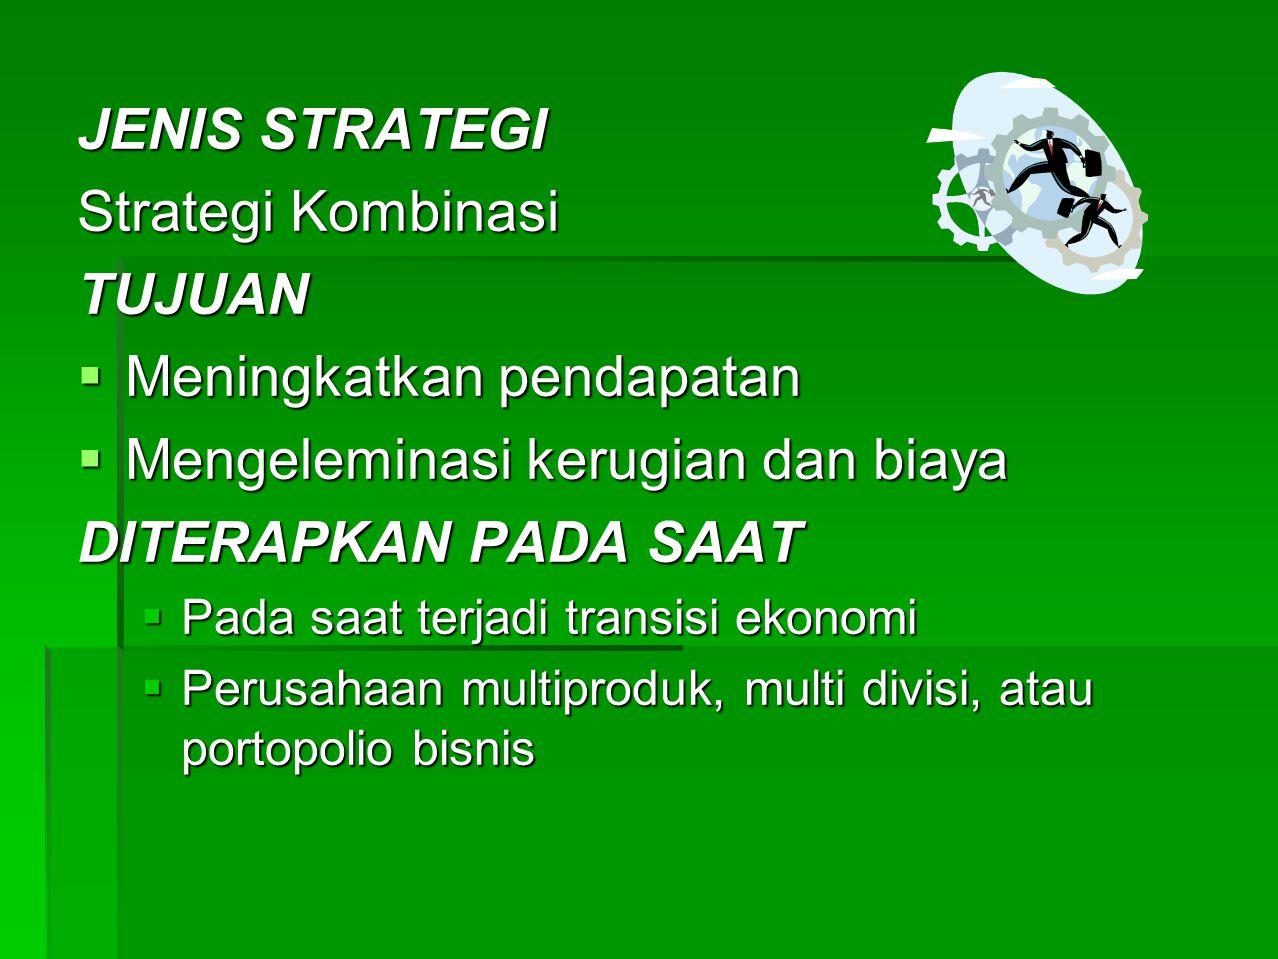 JENIS-JENIS STRATEGI PERTUMBUHAN / EKSPANSI  STRATEGI PERTUMBUHAN KONSENTRASI  STRATEGI INTEGRASI VERTIKAL  STRATEGI DIVERSIFIKASI  STARTEGI INTERNAL & EKSTERNAL